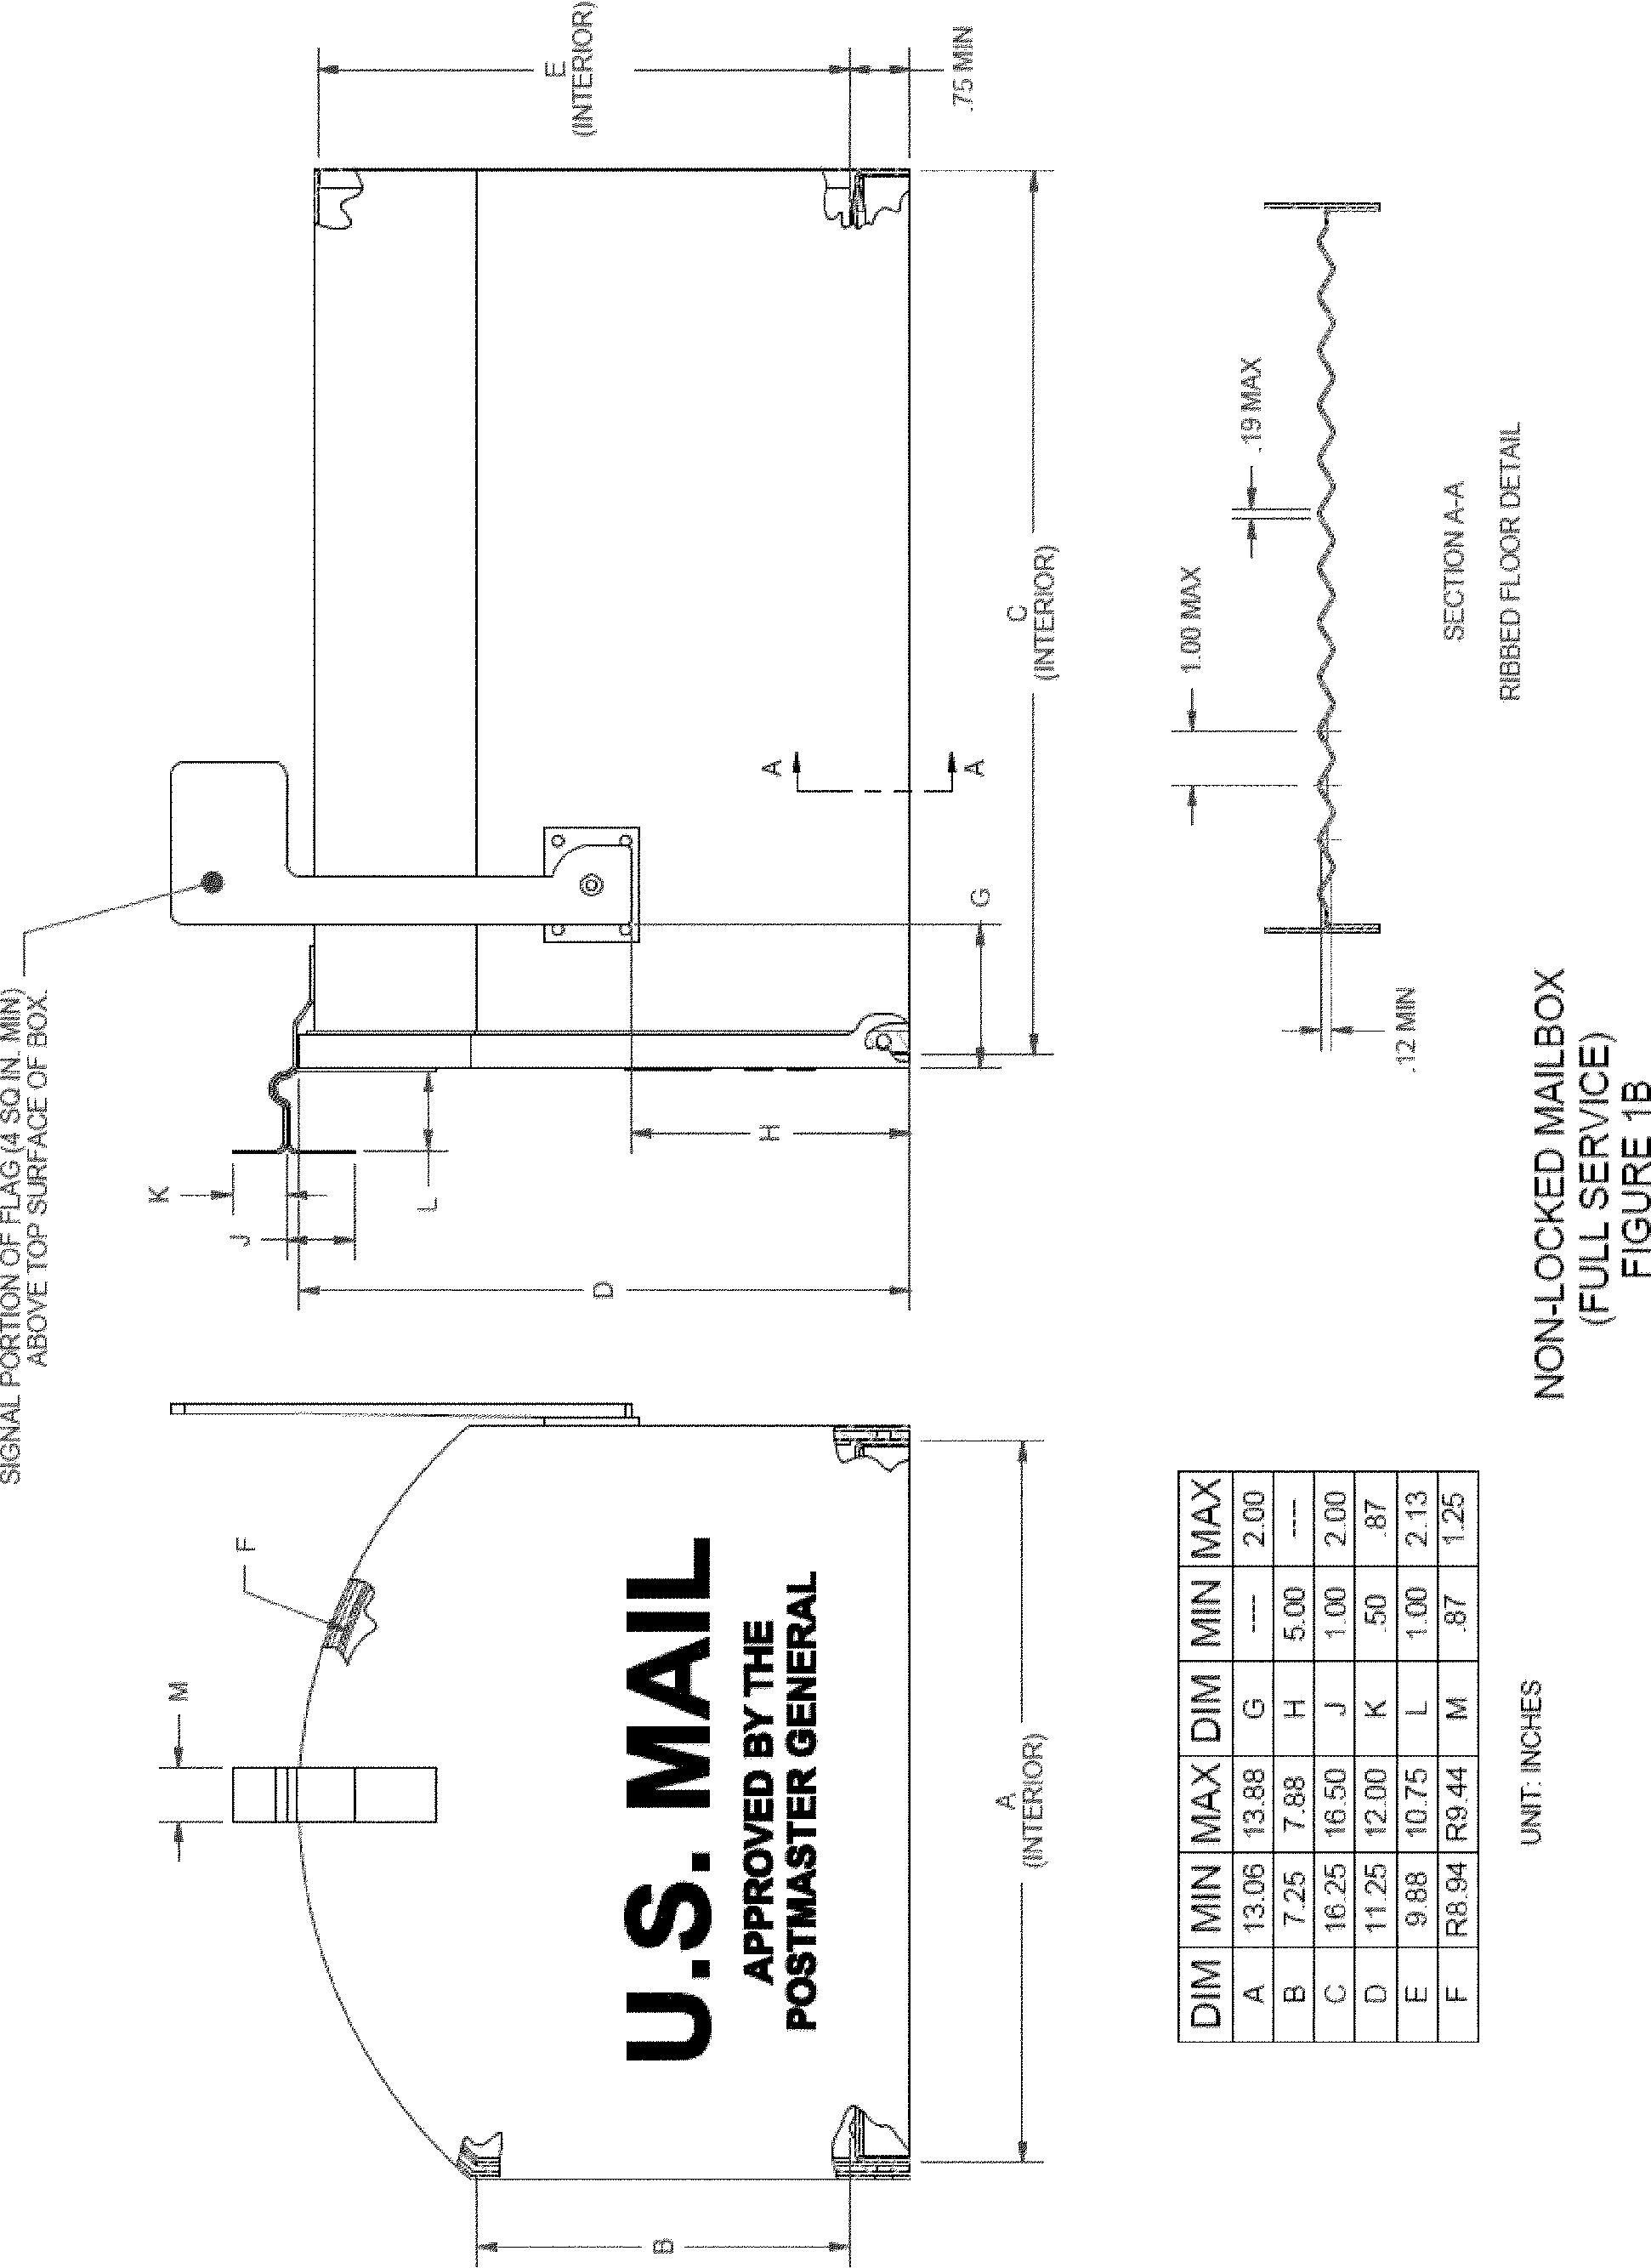 Start Printed Page 19924